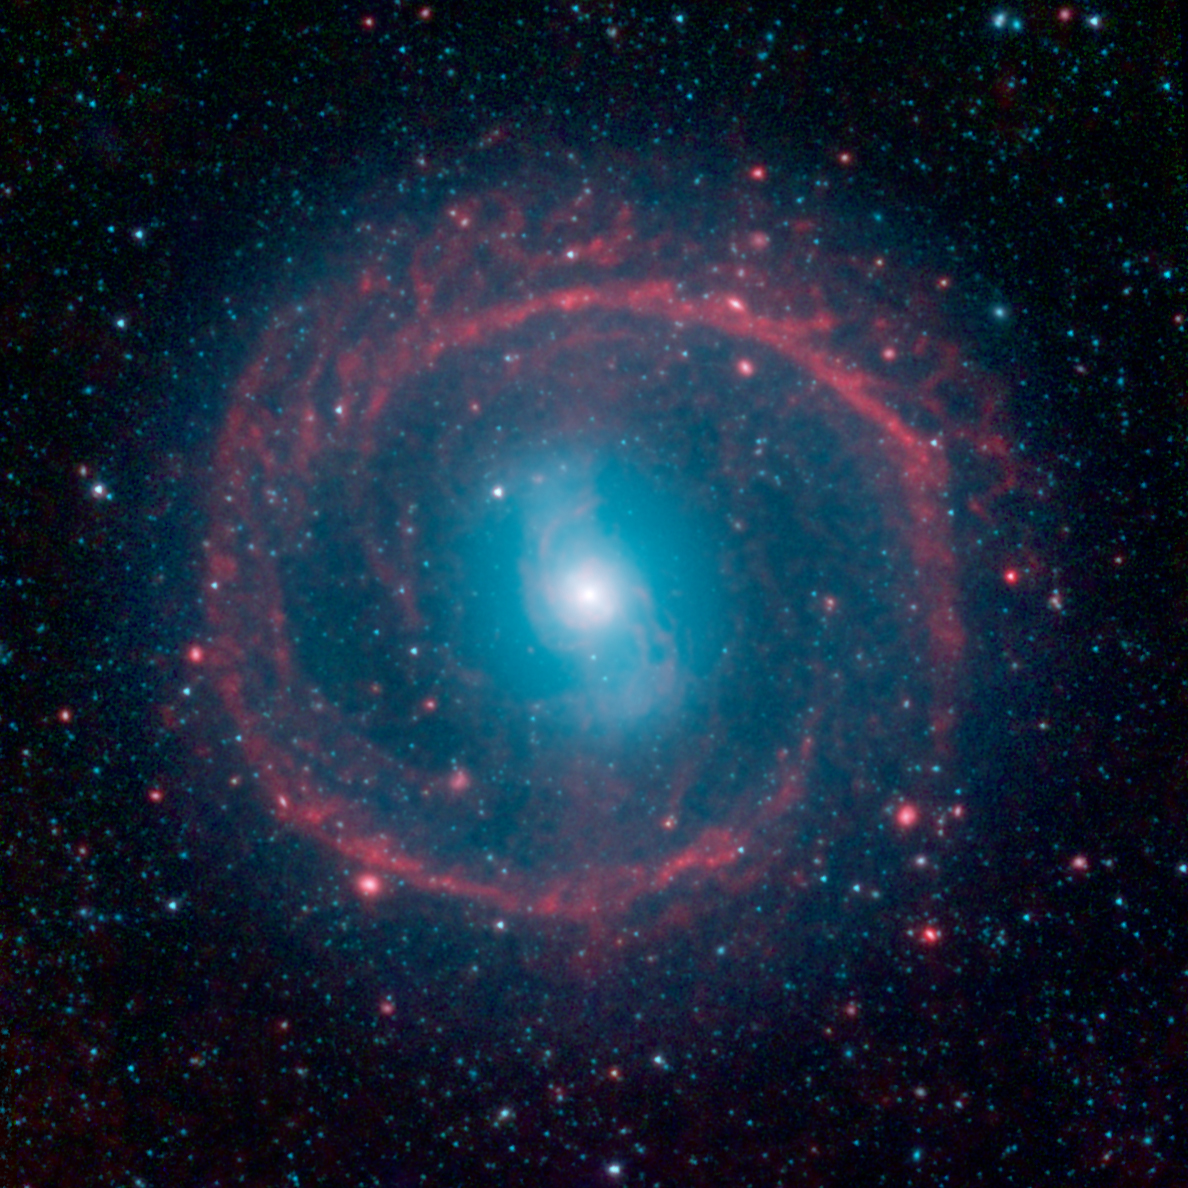 ring of stellar fire